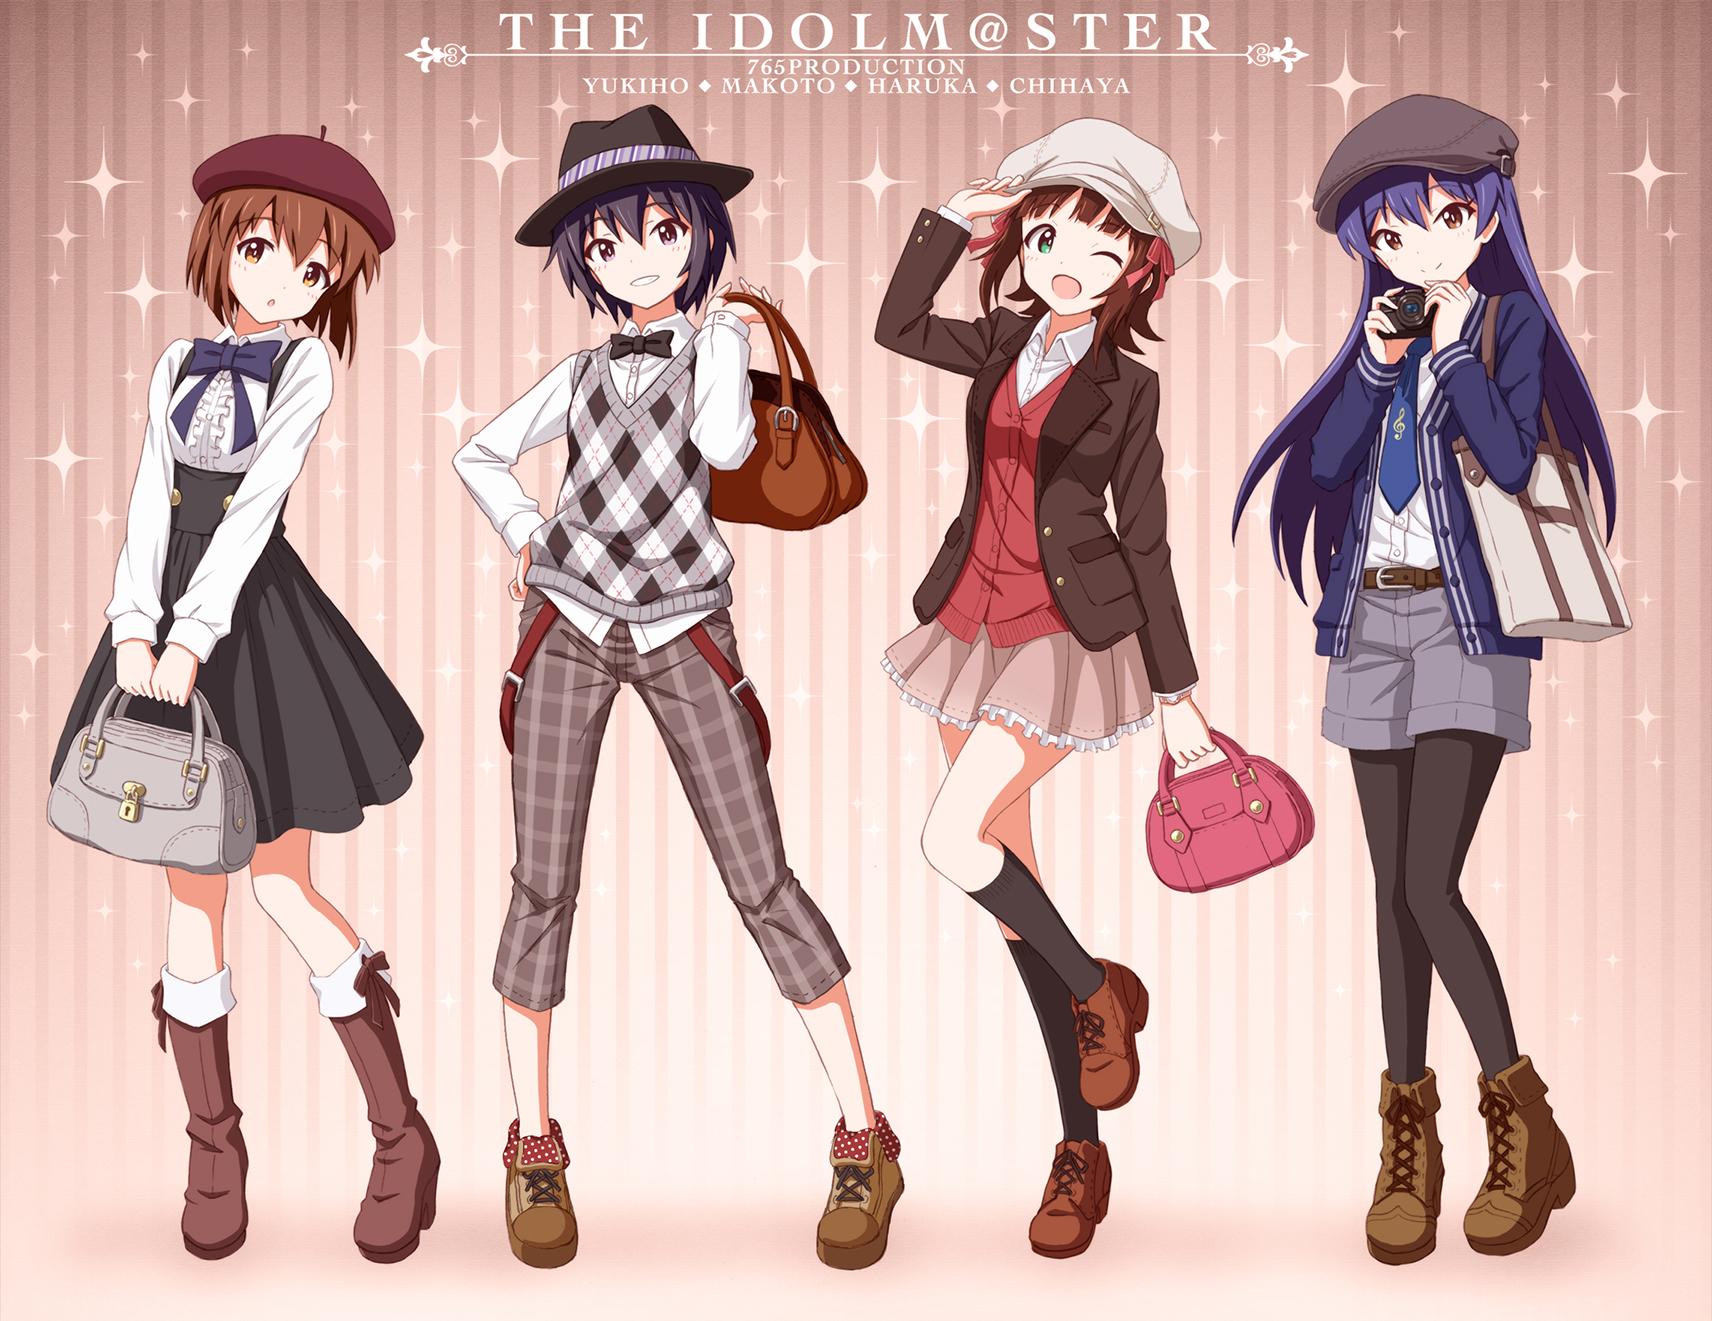 anime_wallpaper_Idol_Master_4762497-46685116_p0.jpg